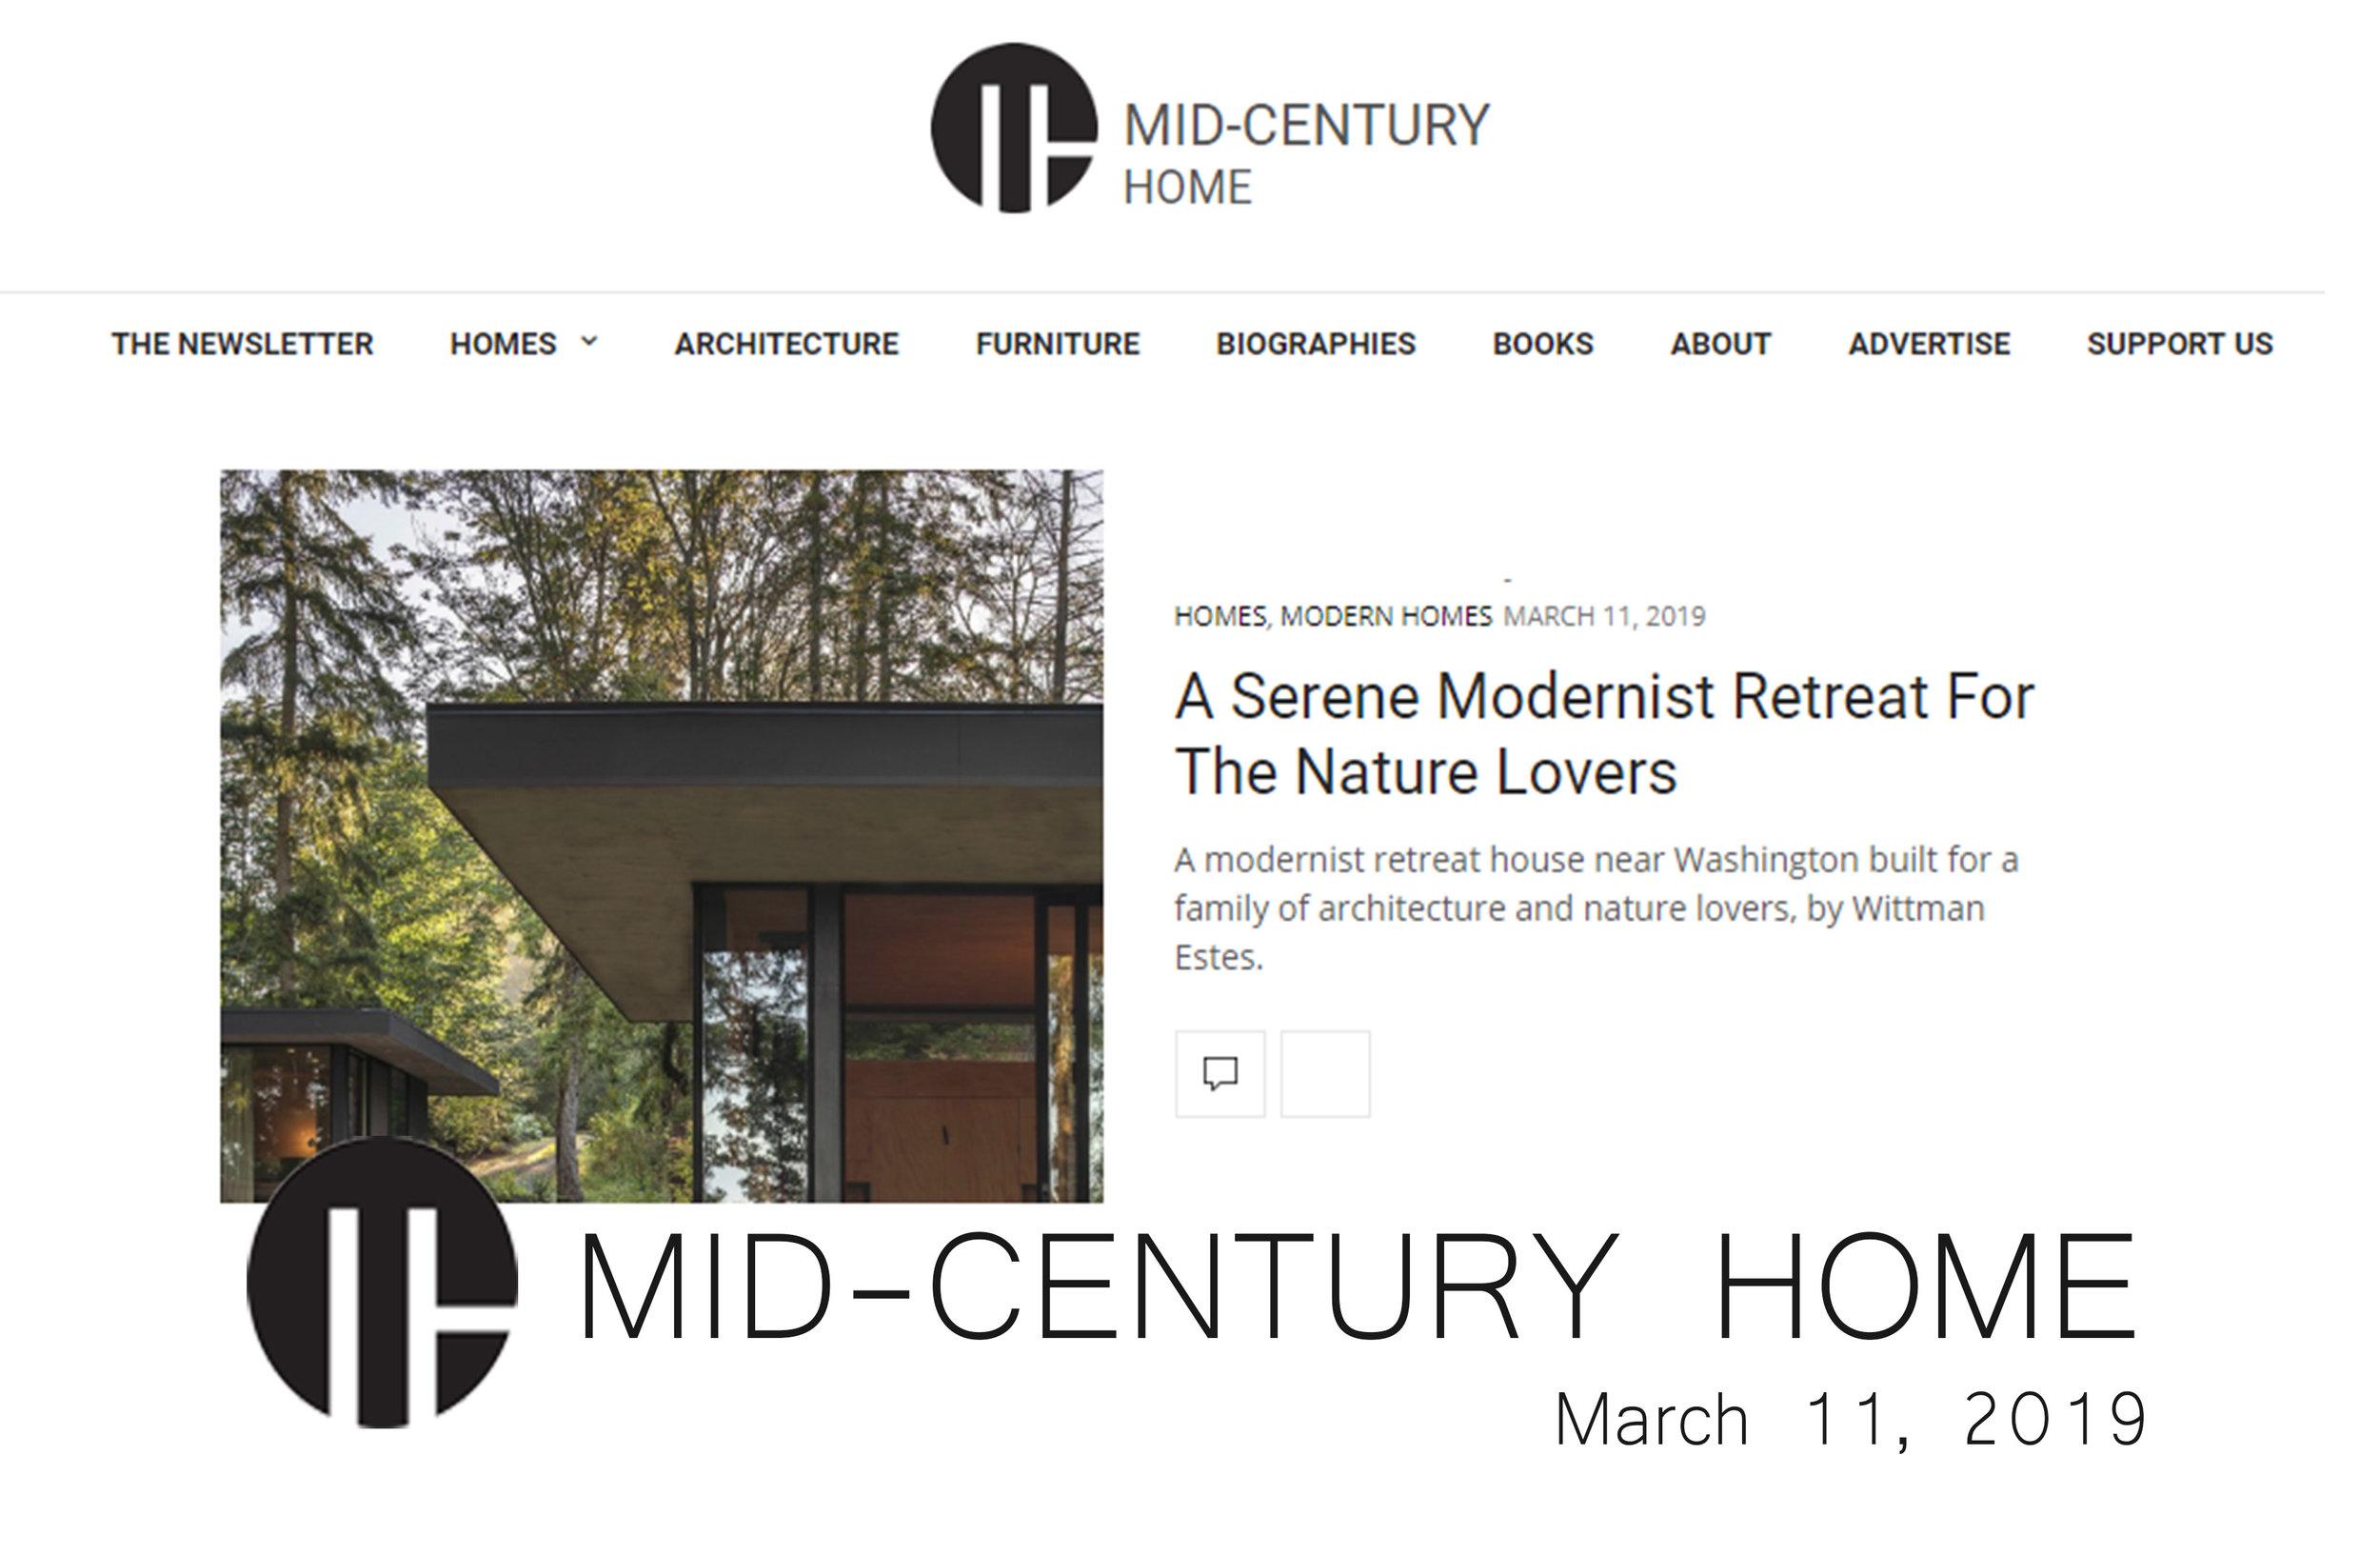 2019_03_11 Mid-century Home.jpg